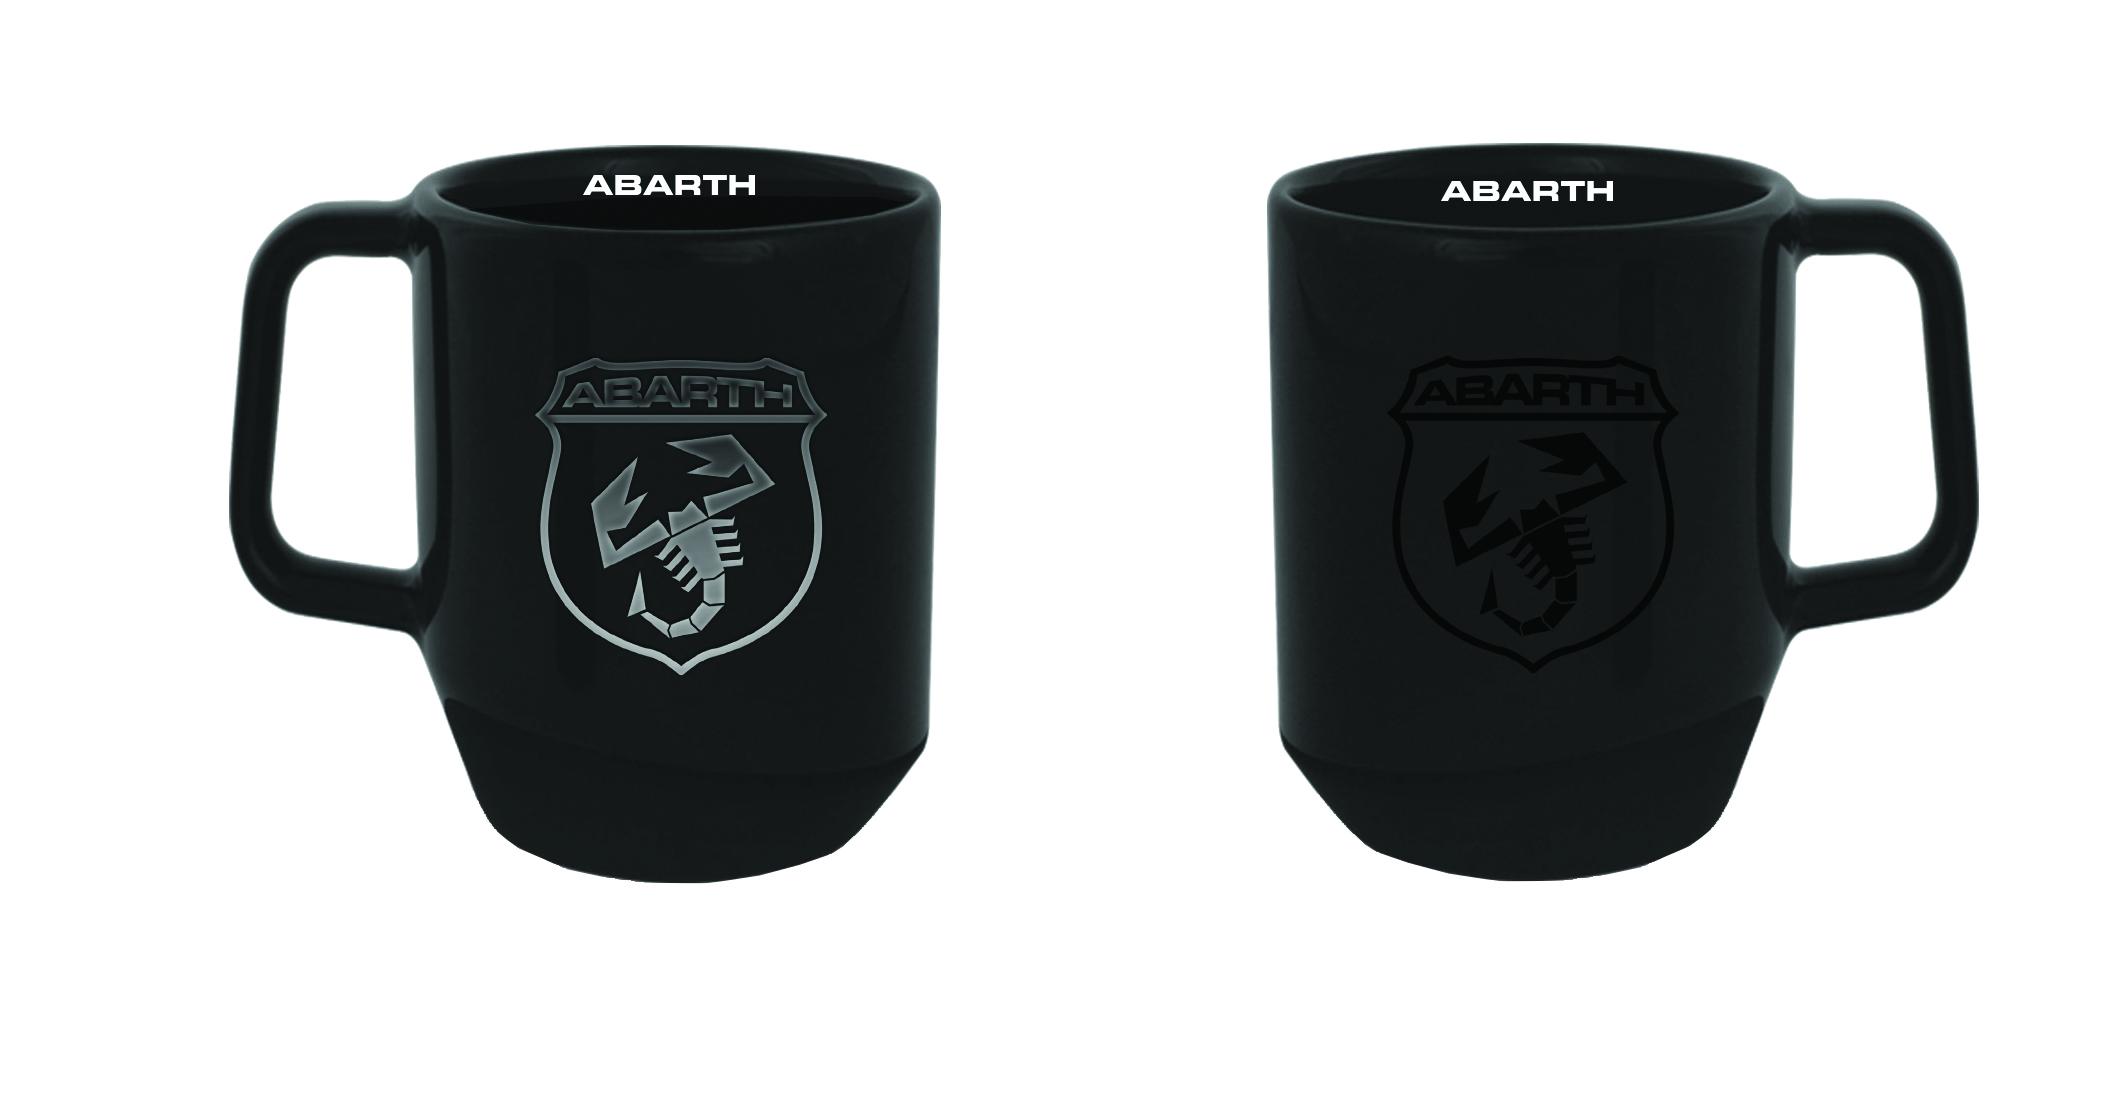 New! 2021 Fiat Abarth Corse Black Heat Sensitive Mug Official Team Merchandise